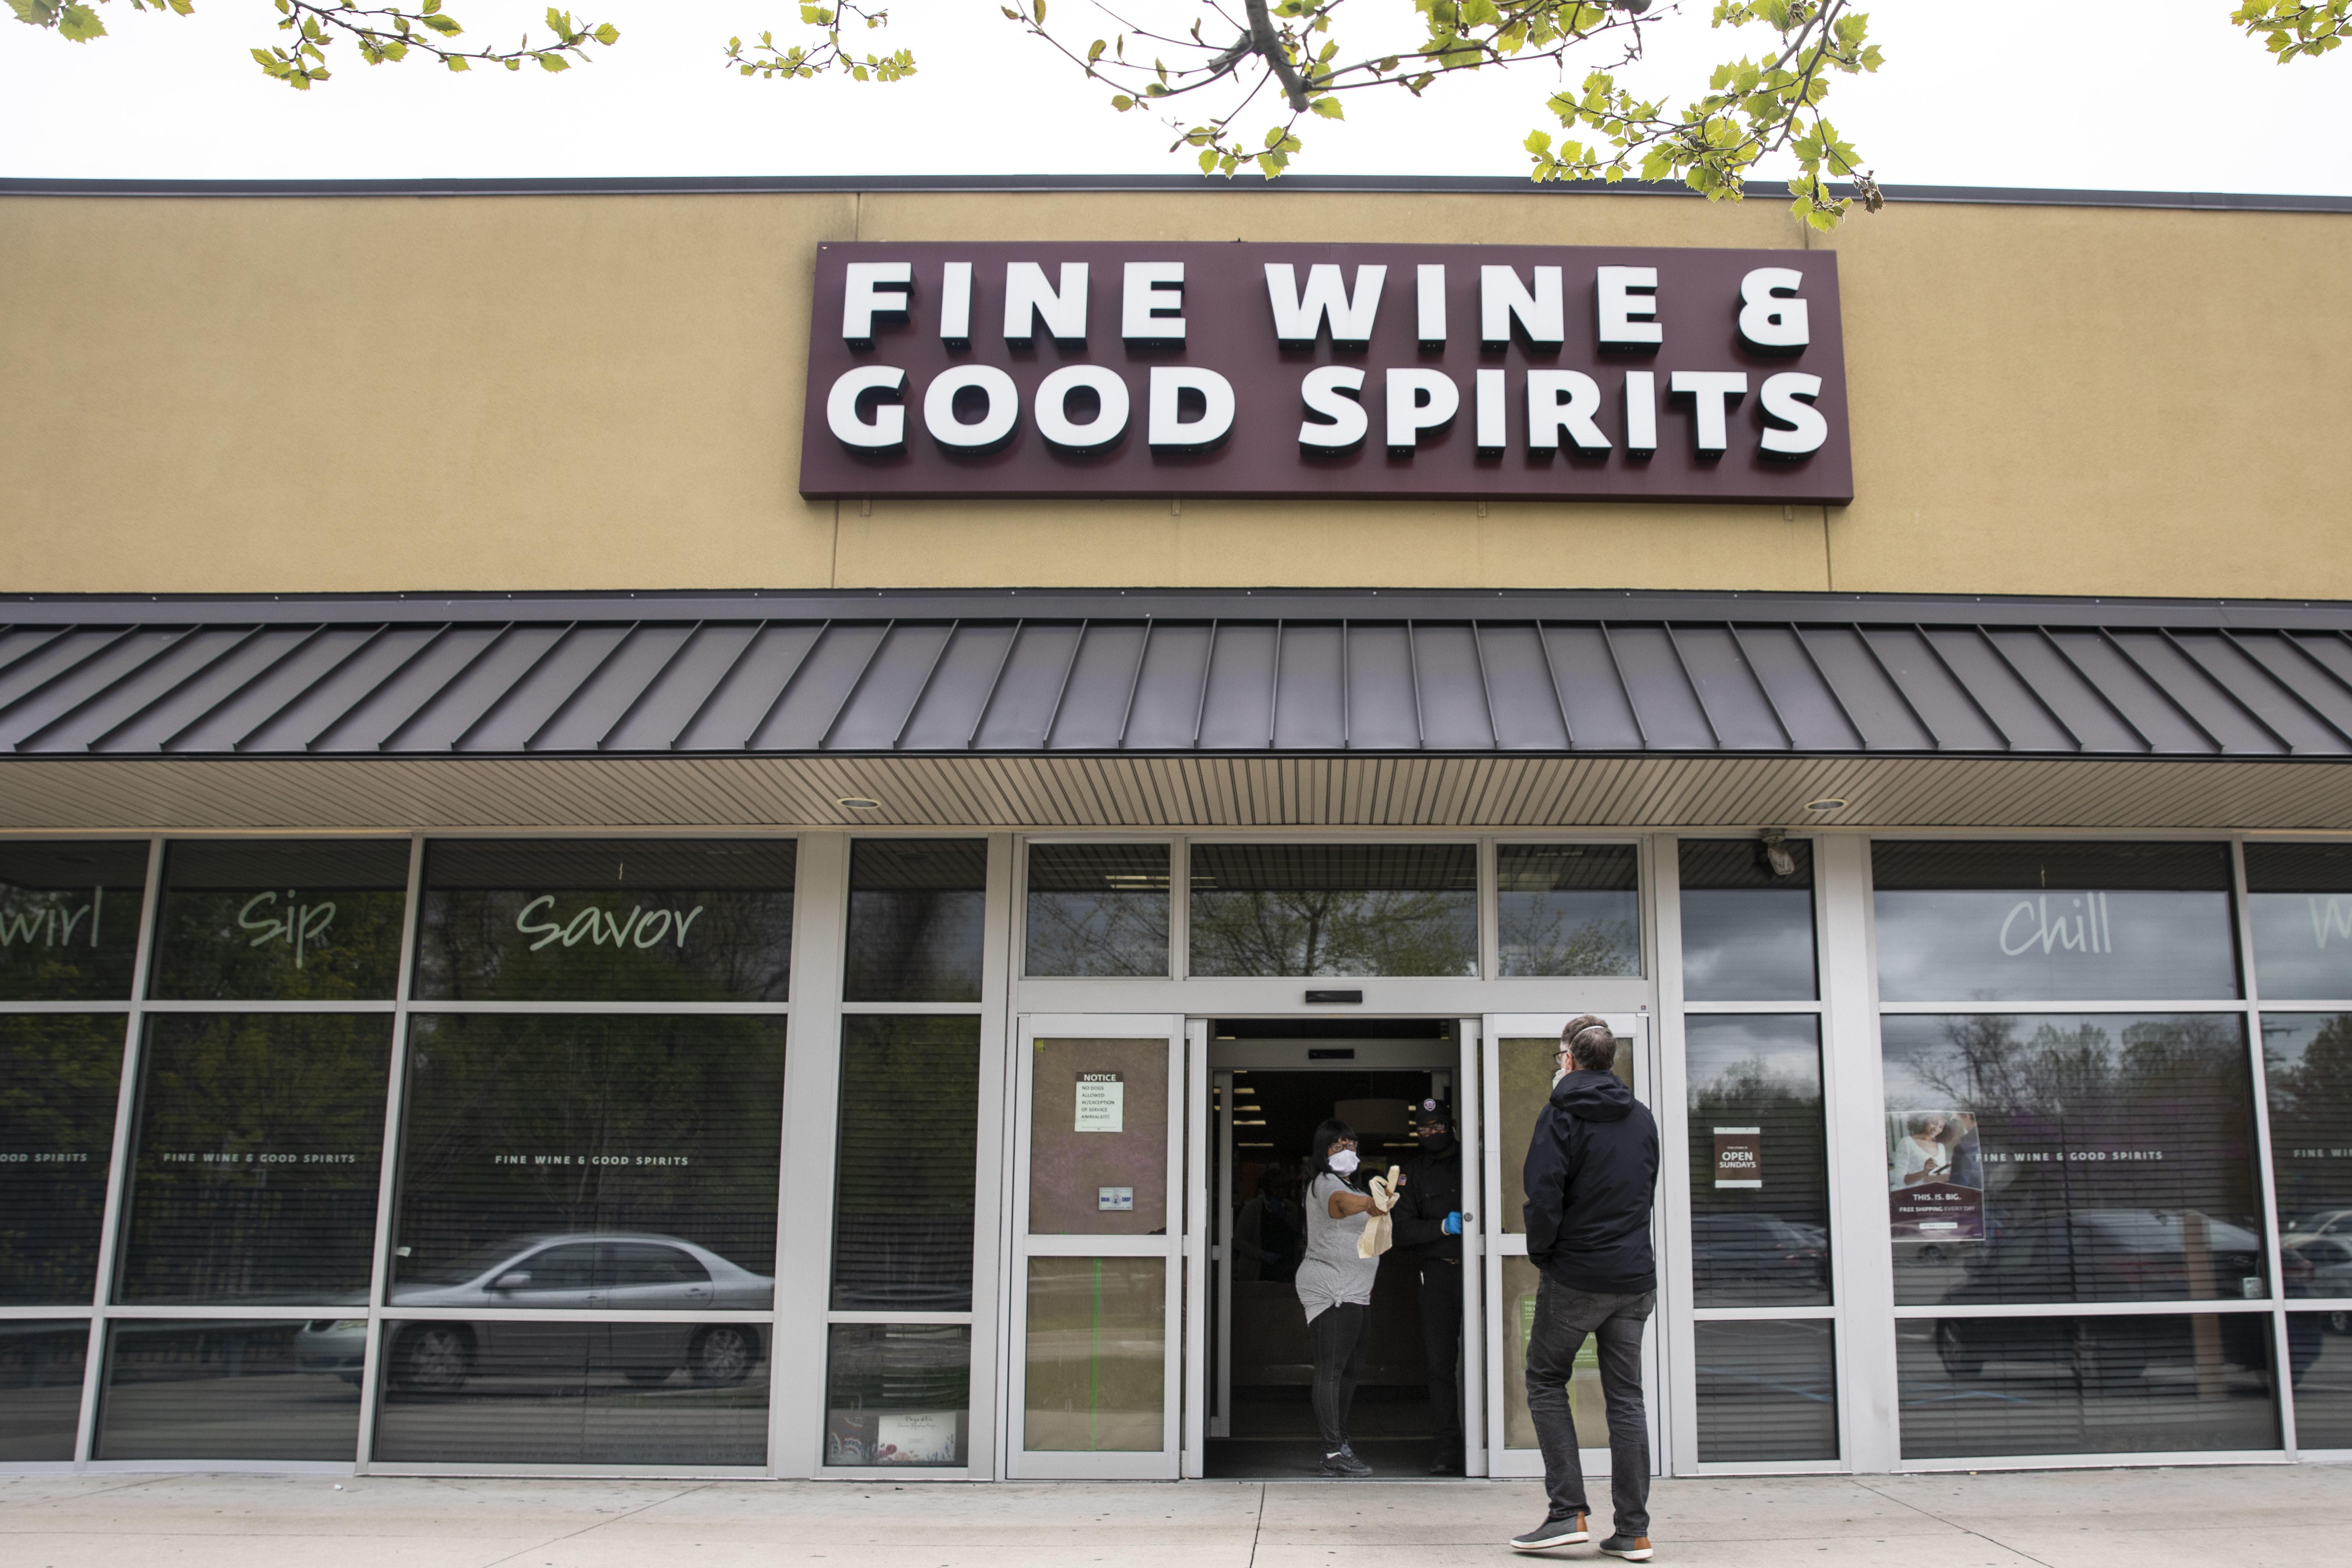 28 Fine Wine And Good Spirits Stores Now Open In Philadelphia Area